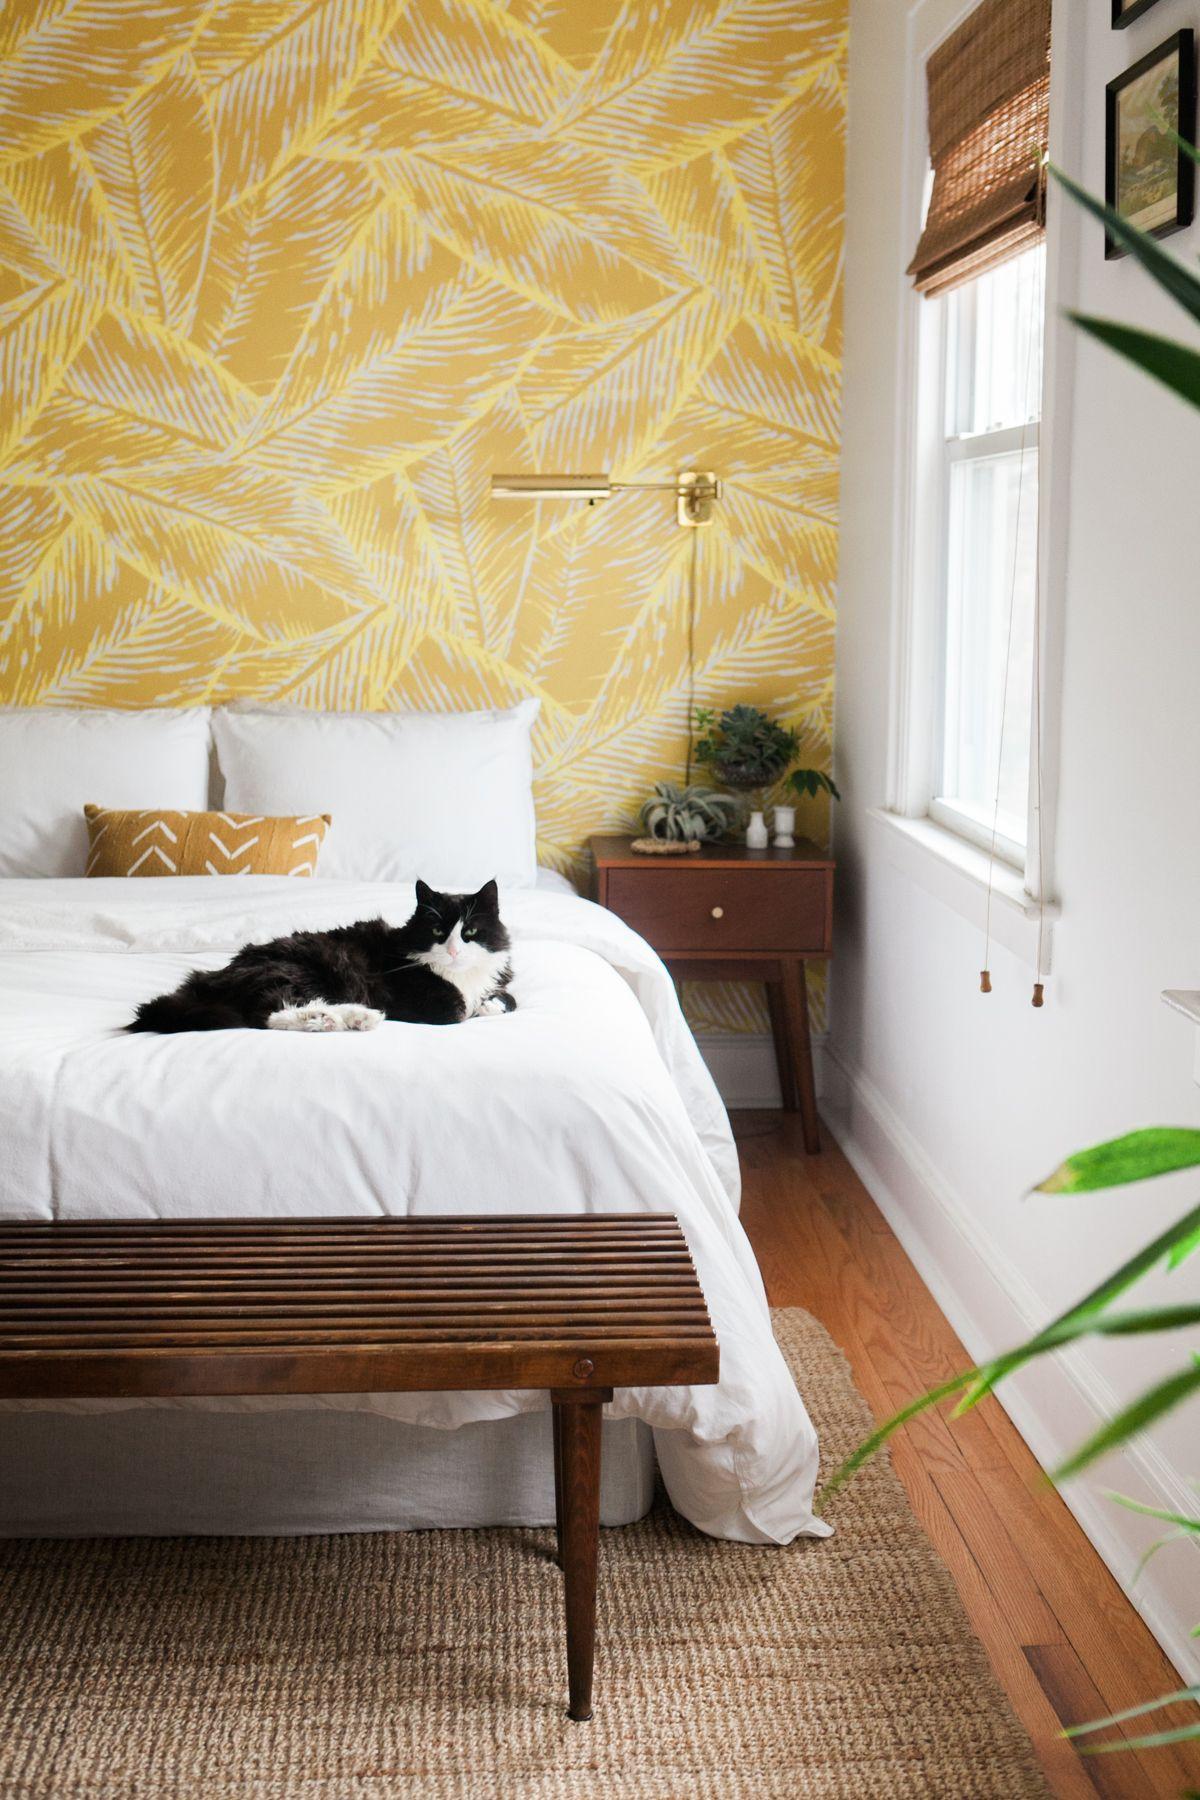 Wallpaper And Hardwood Yellow Home Decor Diy Home Decor Bedroom Home Decor Bedroom